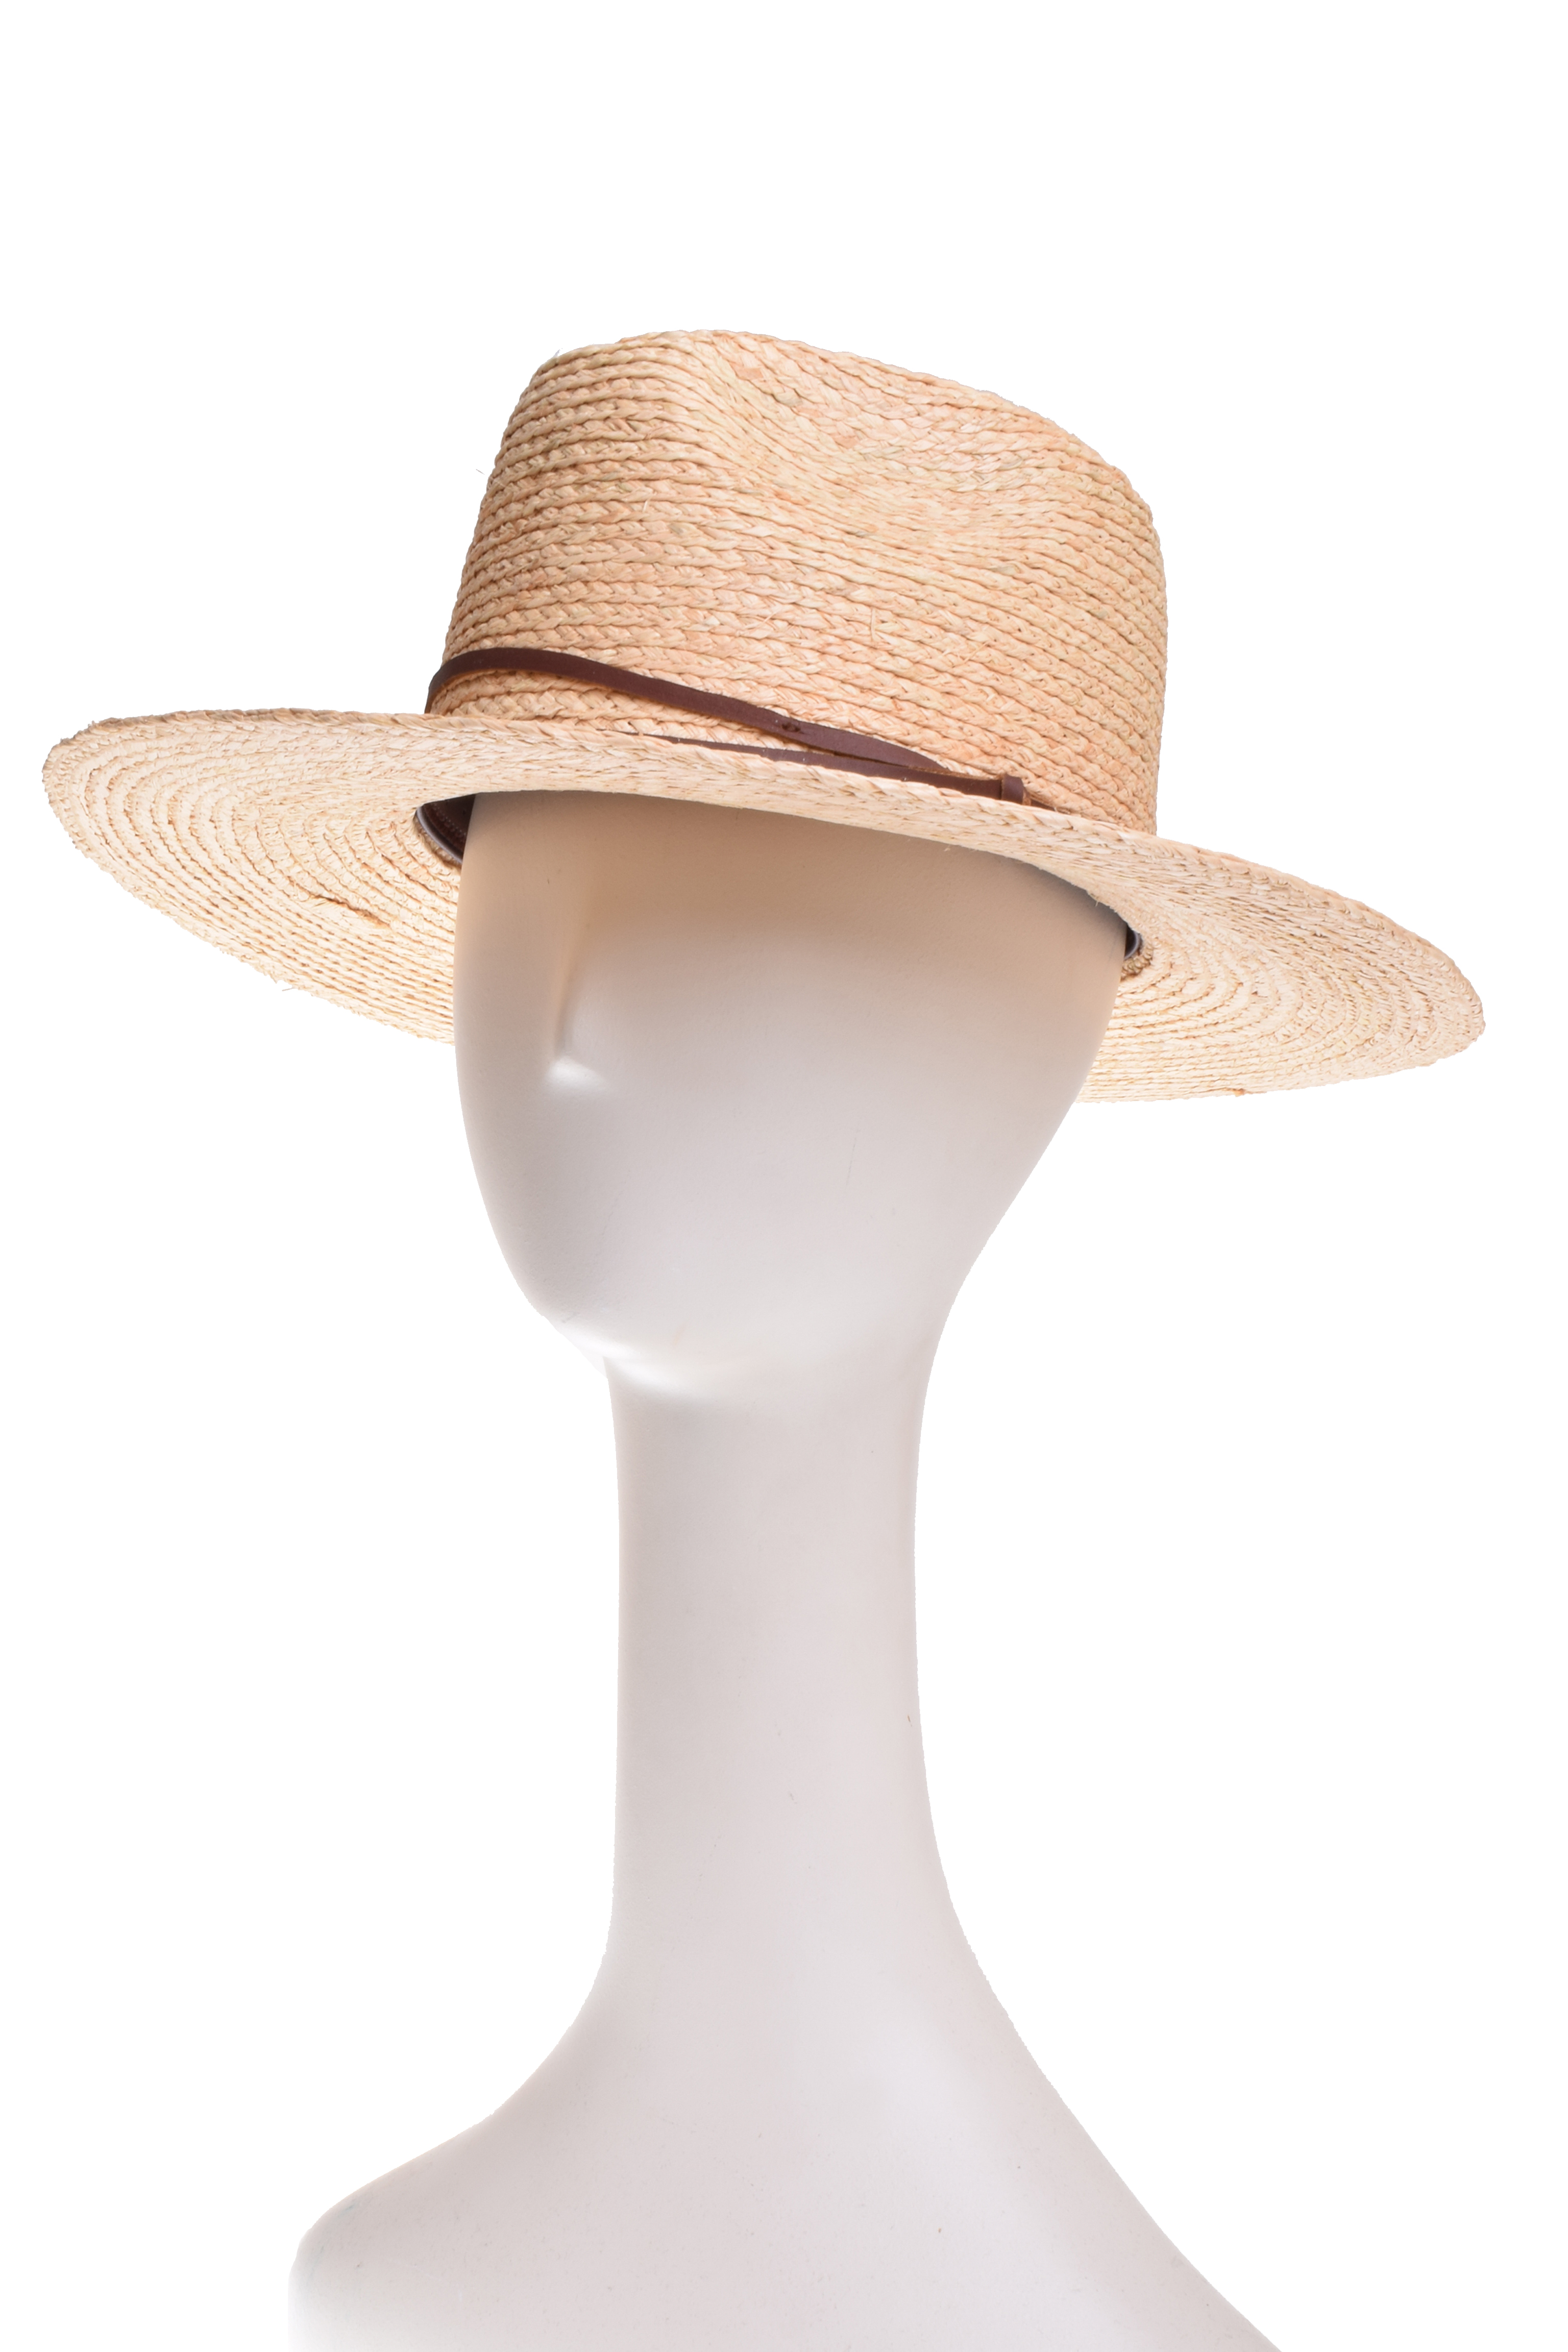 Brixton Unisex Simpson Fedora Hat - Honey - Walmart.com 93f3fbb1151